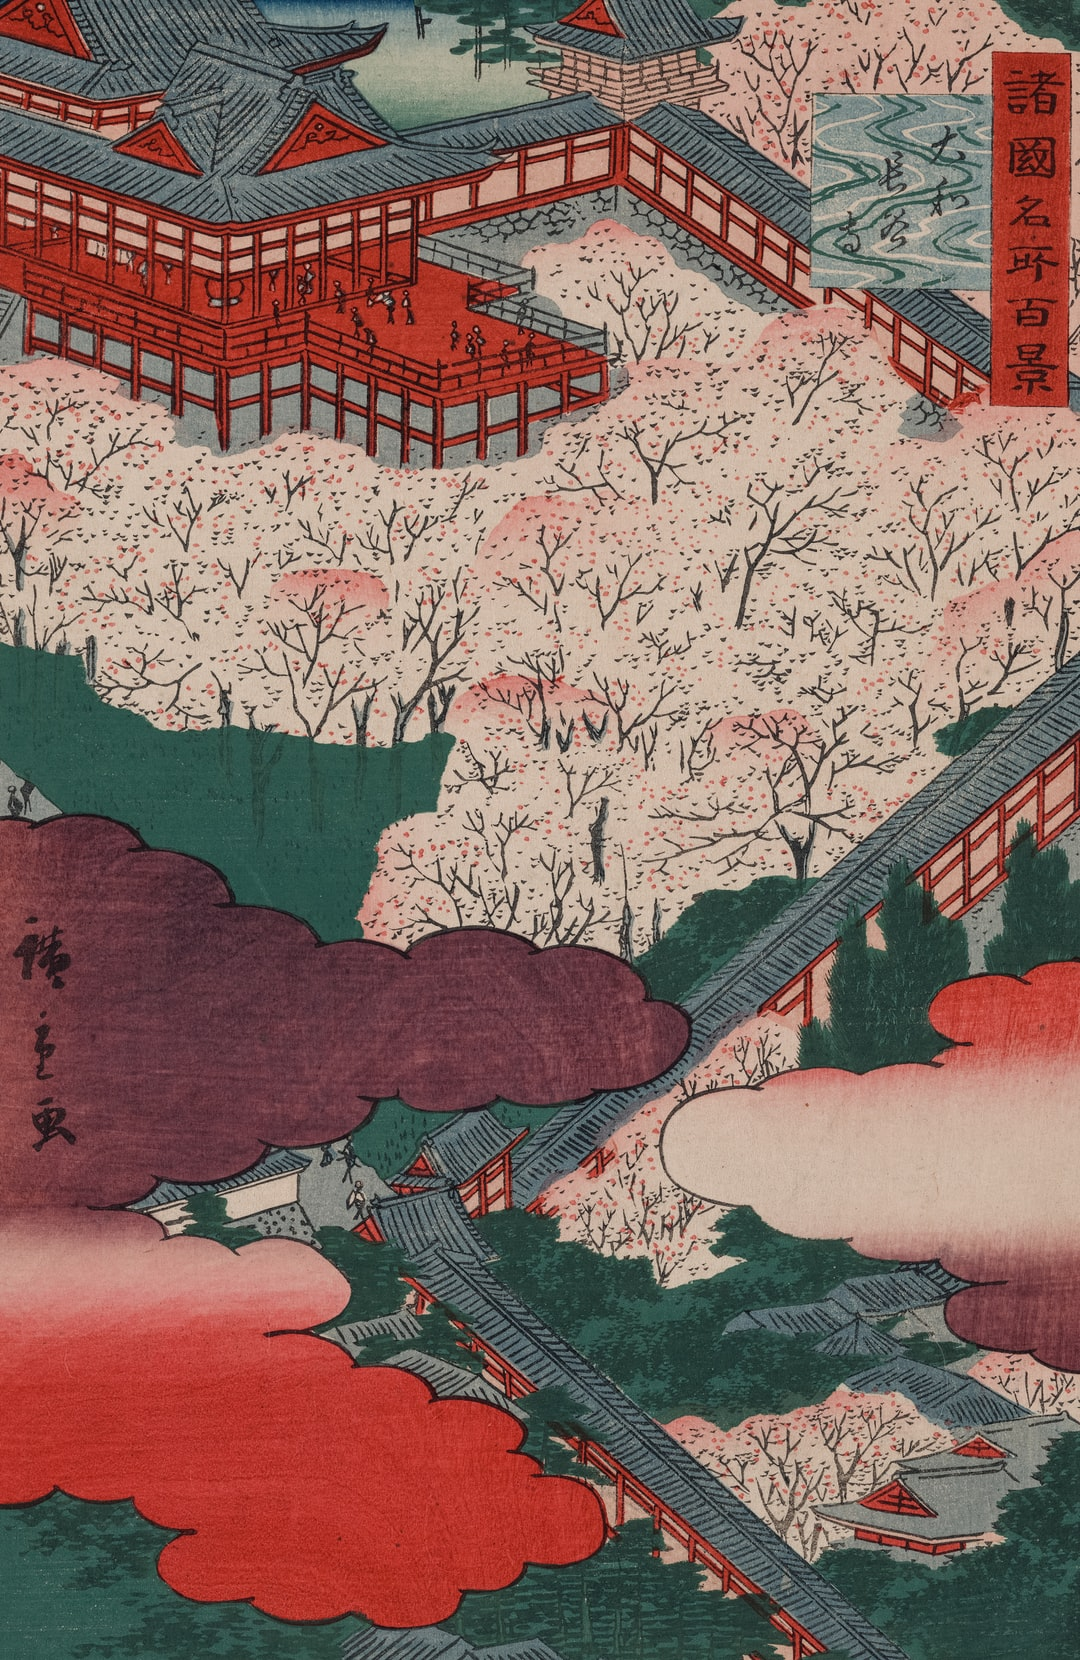 Yamato hasedera. [Translation: Hasedera in Yamato Province]. Woodcut print by Utagawa Hiroshige, 1859. Library of Congress Prints & Photographs Division. https://www.loc.gov/resource/jpd.01361/